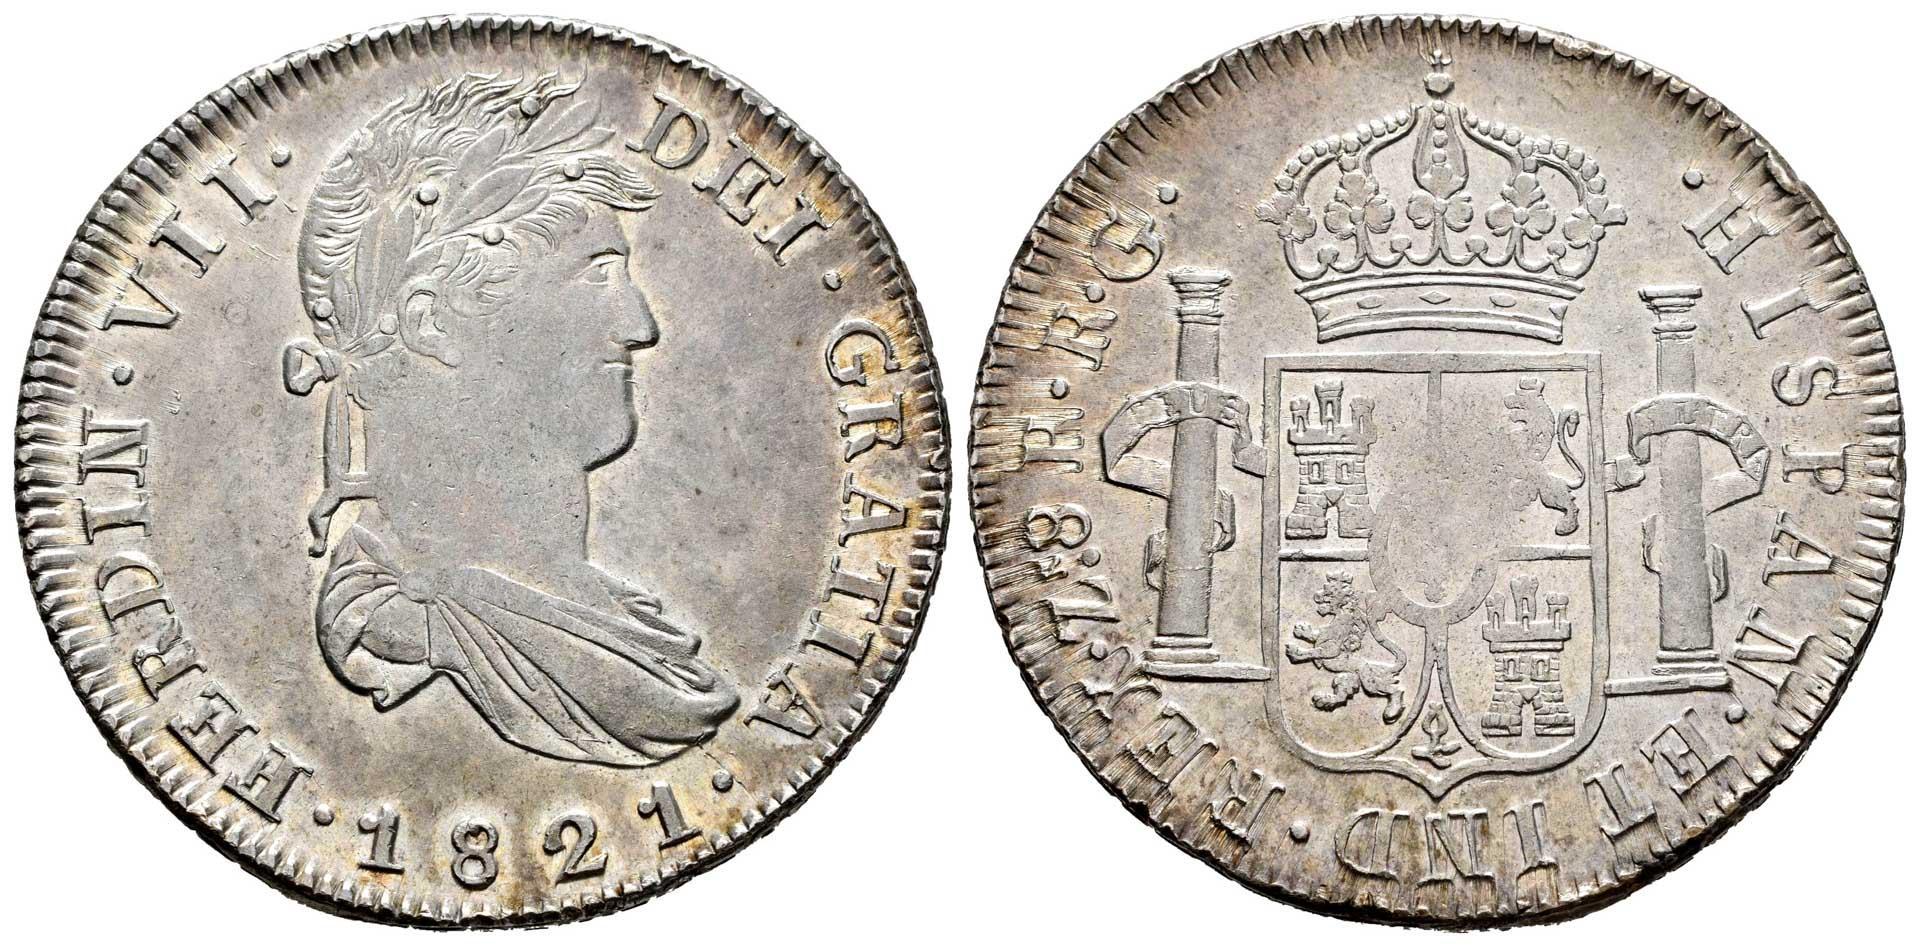 8 Reales Fernando VII 1821 Zacatecas Ferdinand-vii-1808-1833-8-reales-6553451-O